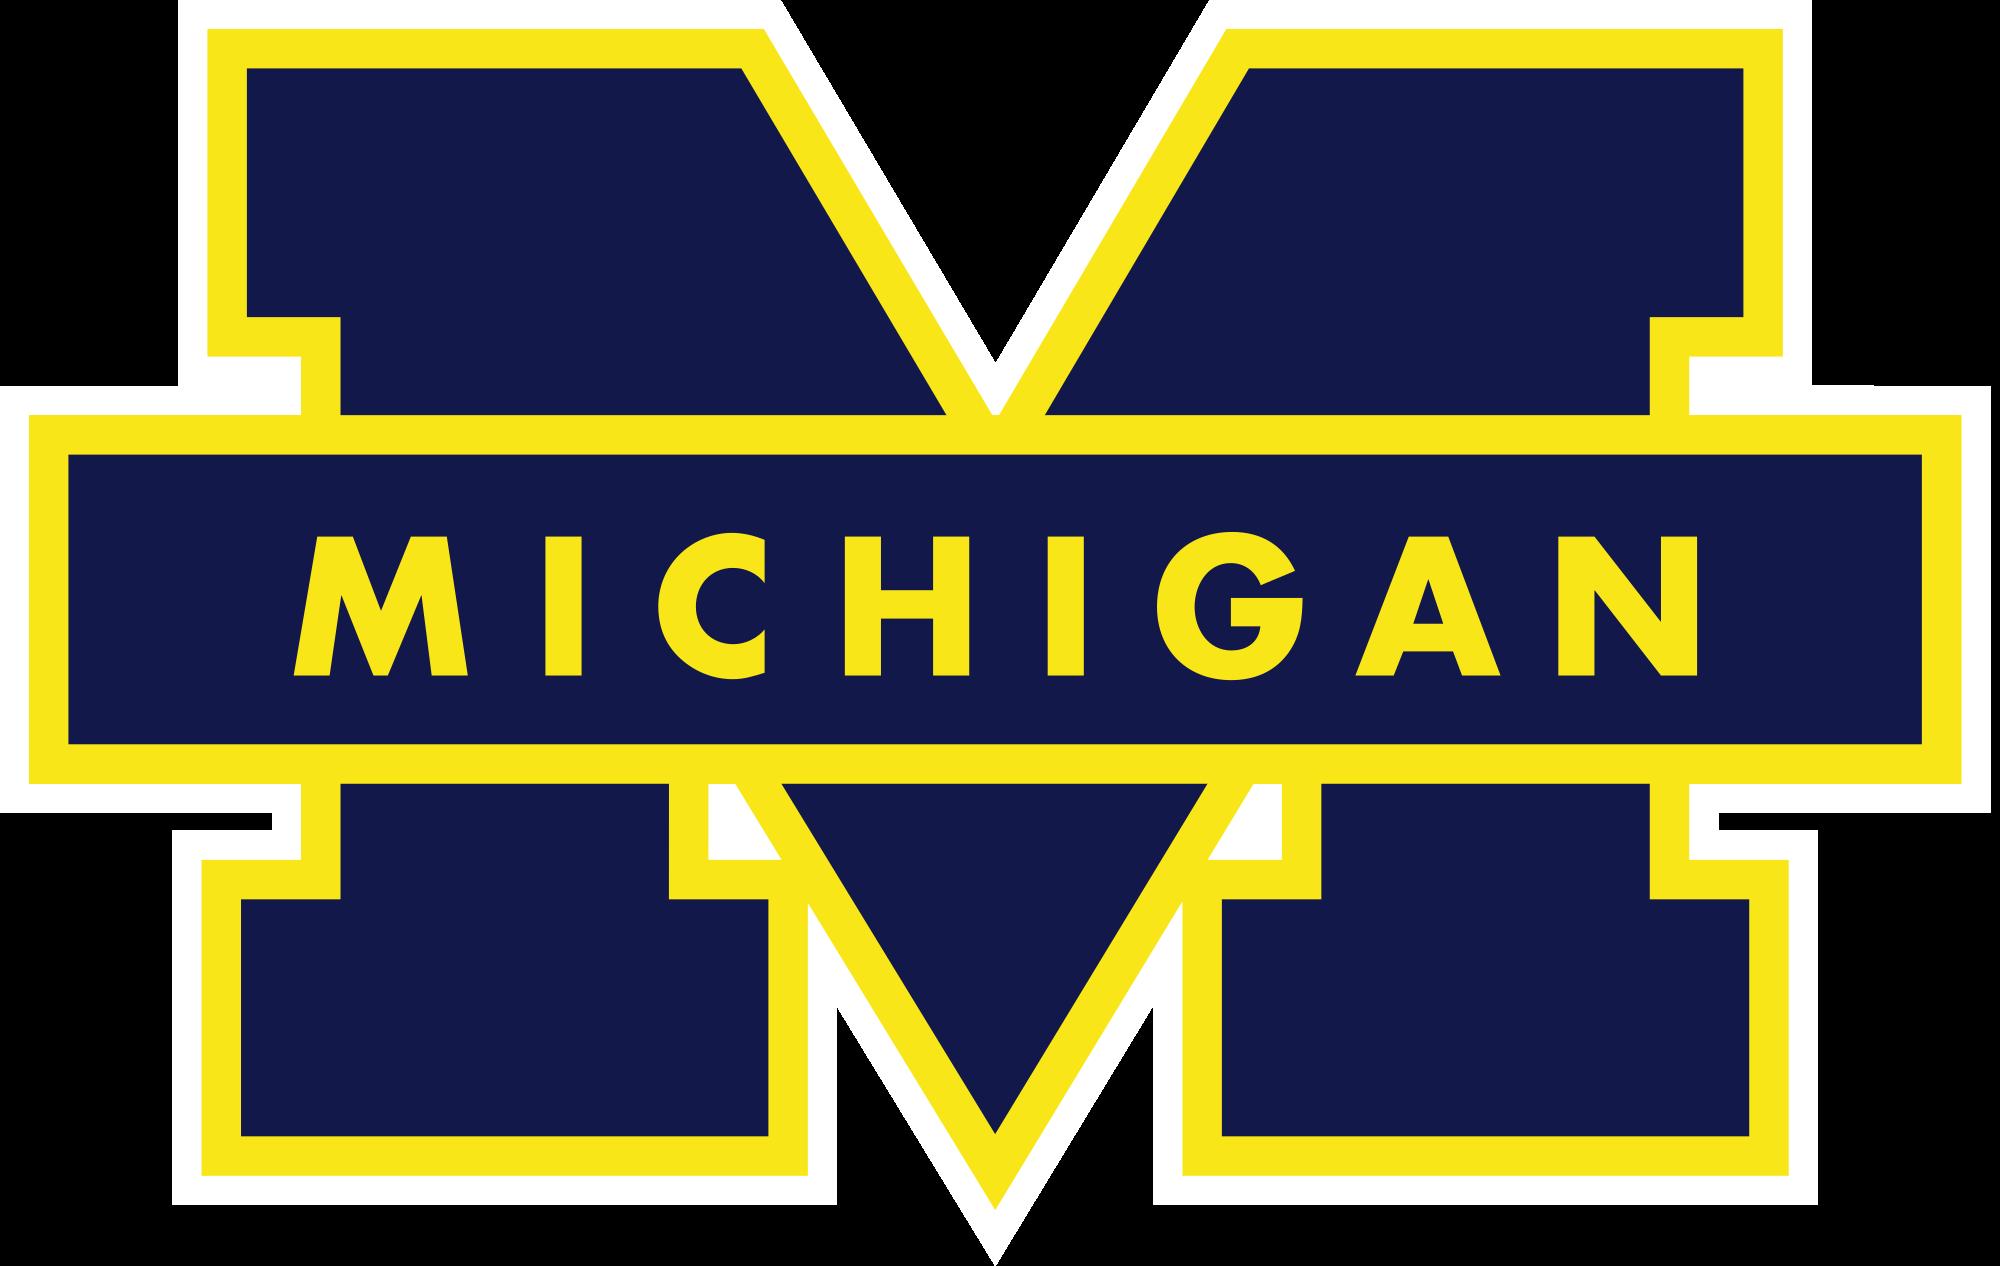 Michigan clipart michigan university. Beilein to remain at